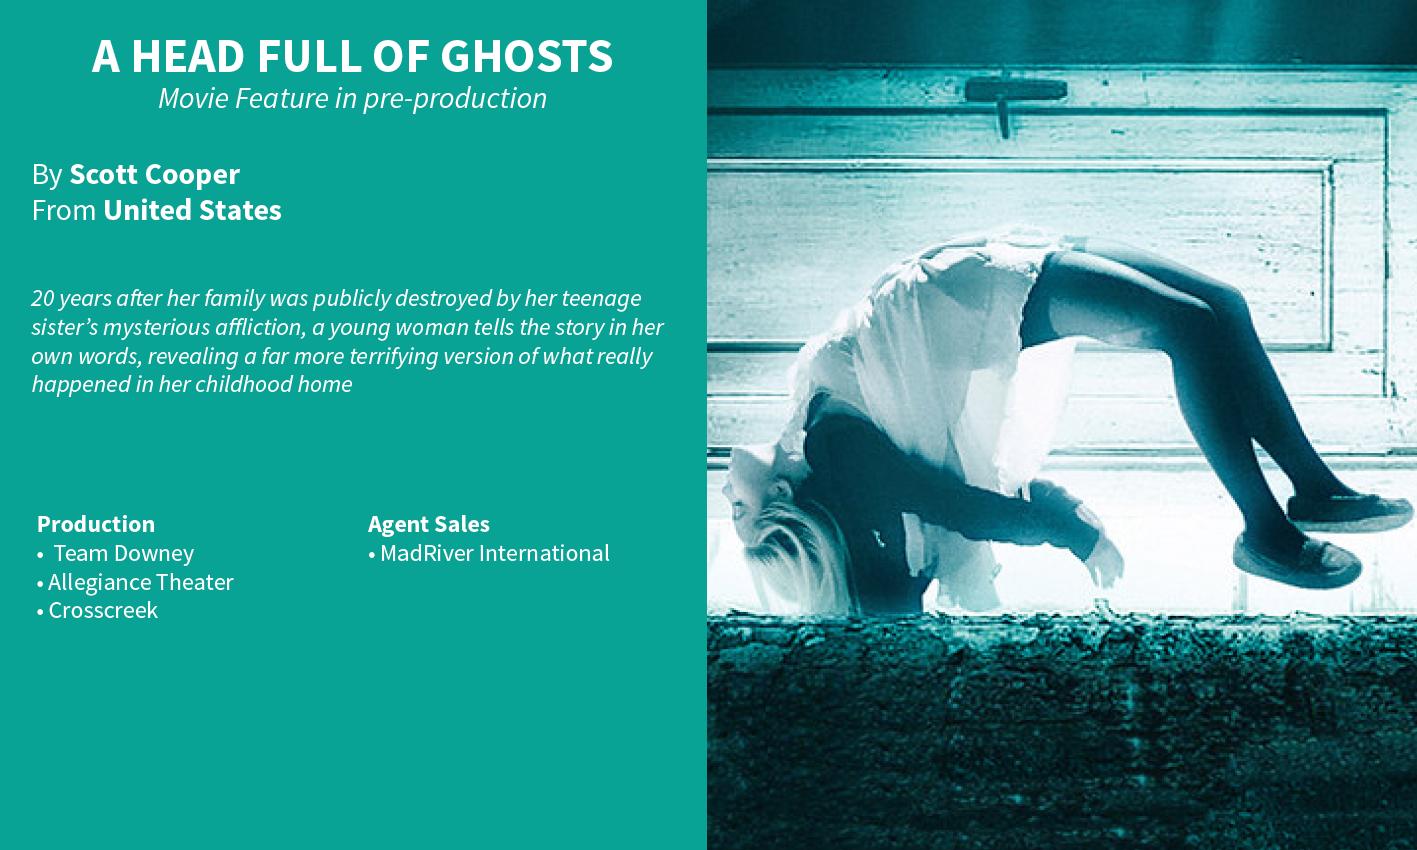 A Head Full of Ghosts Scott Cooper